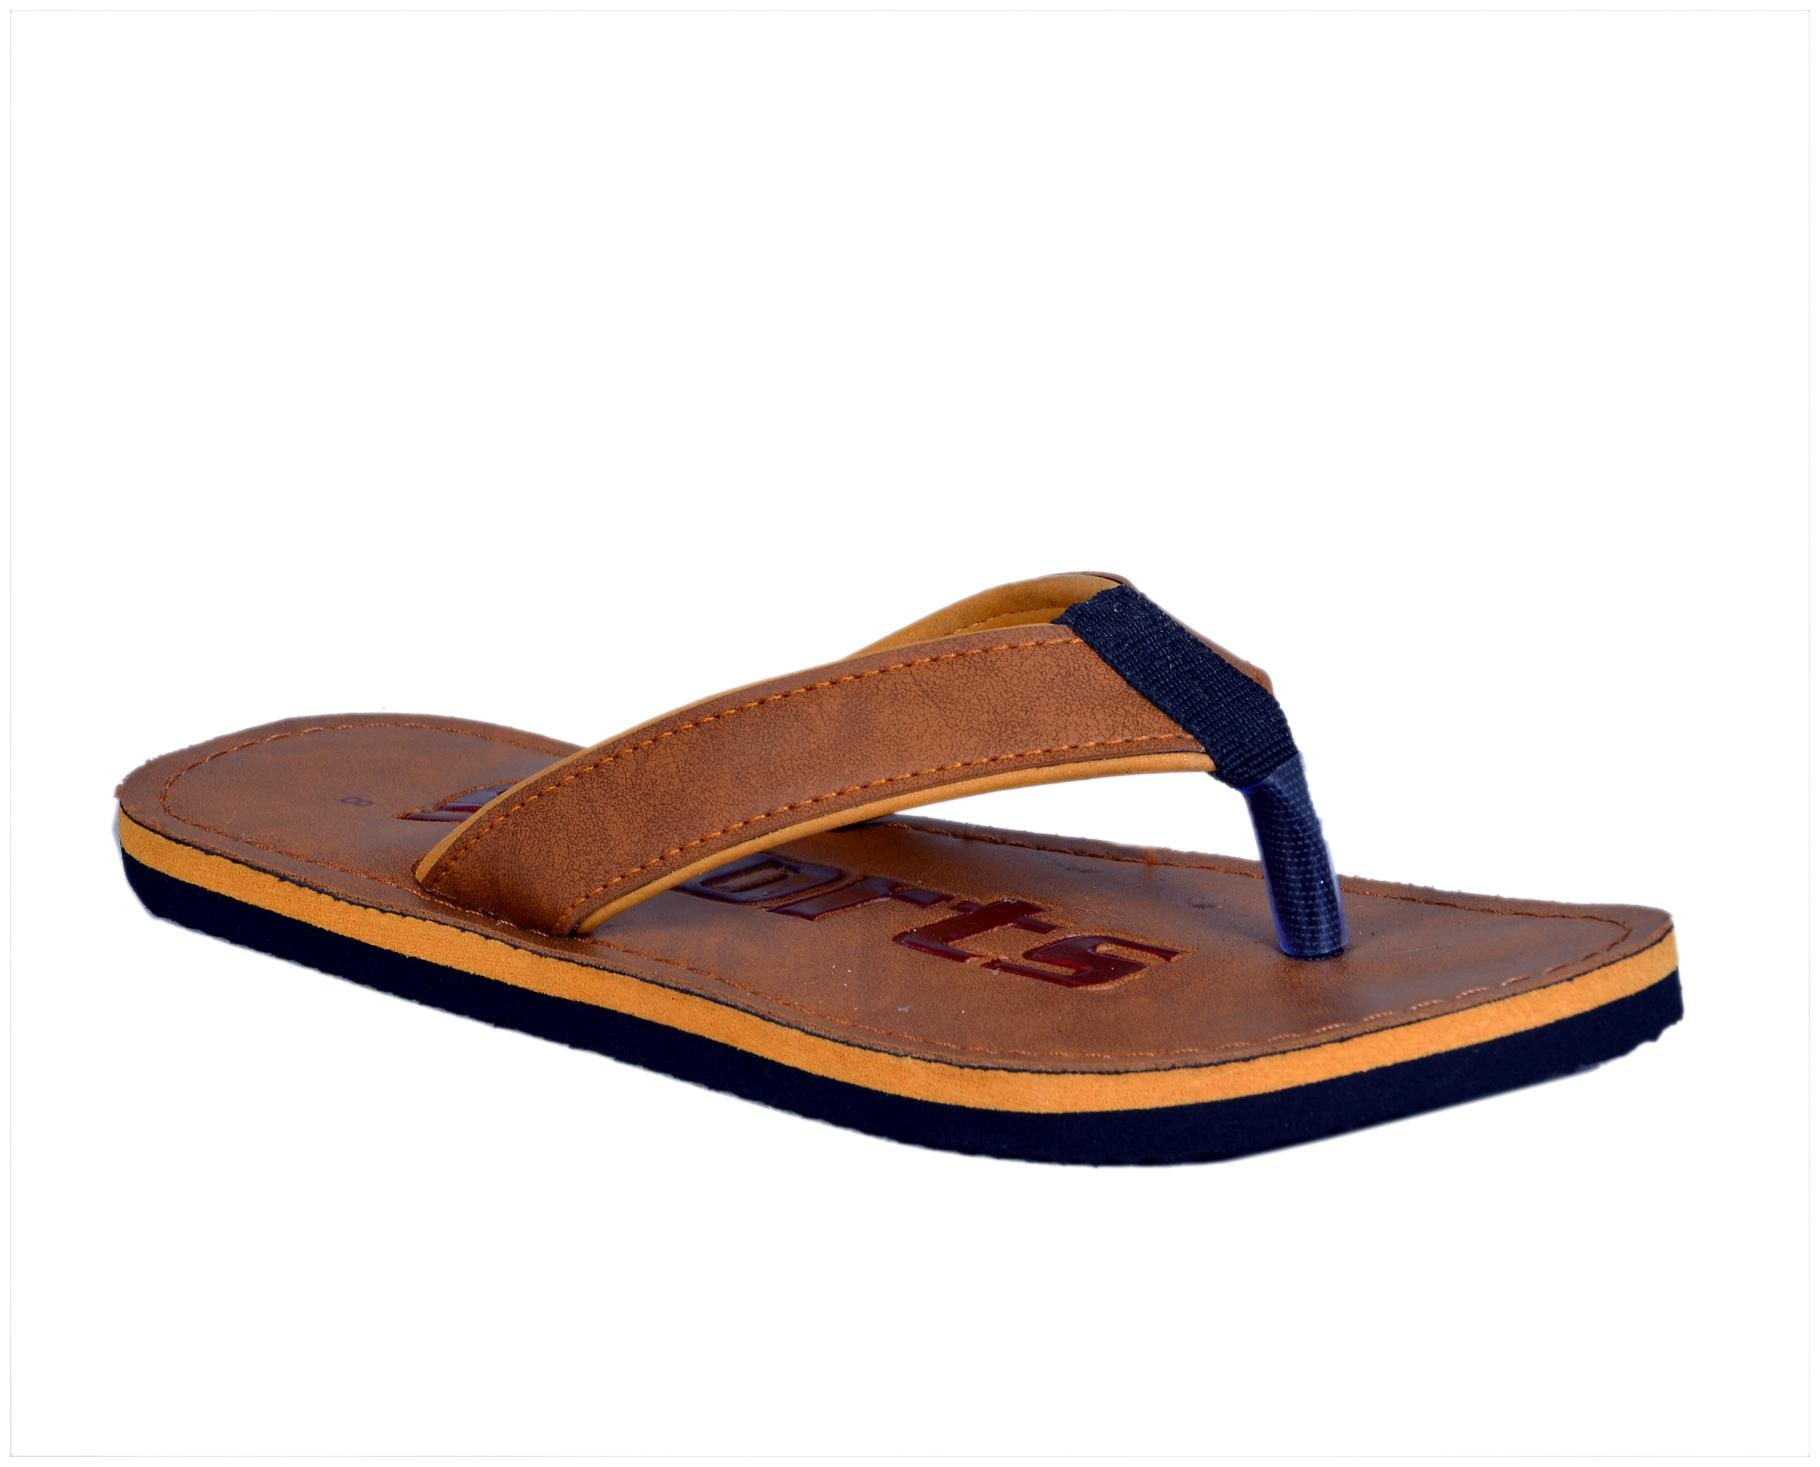 sports shoes efb63 5e7ca Mens Flip Flops & Slippers - Buy Slippers & Flip Flops ...